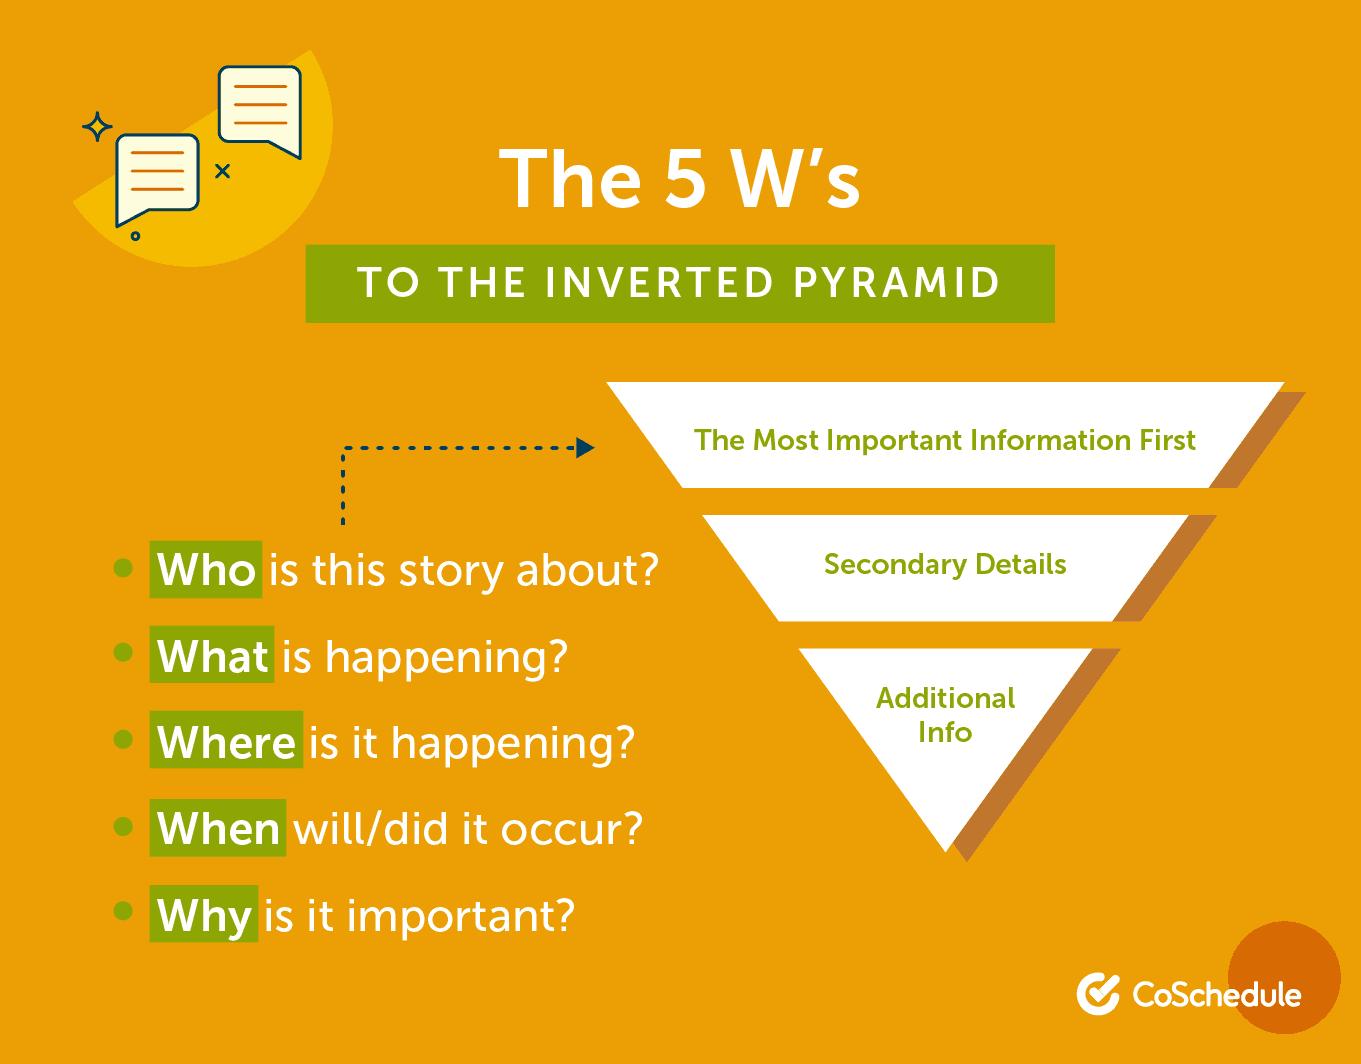 Inverted pyramid 5 ws